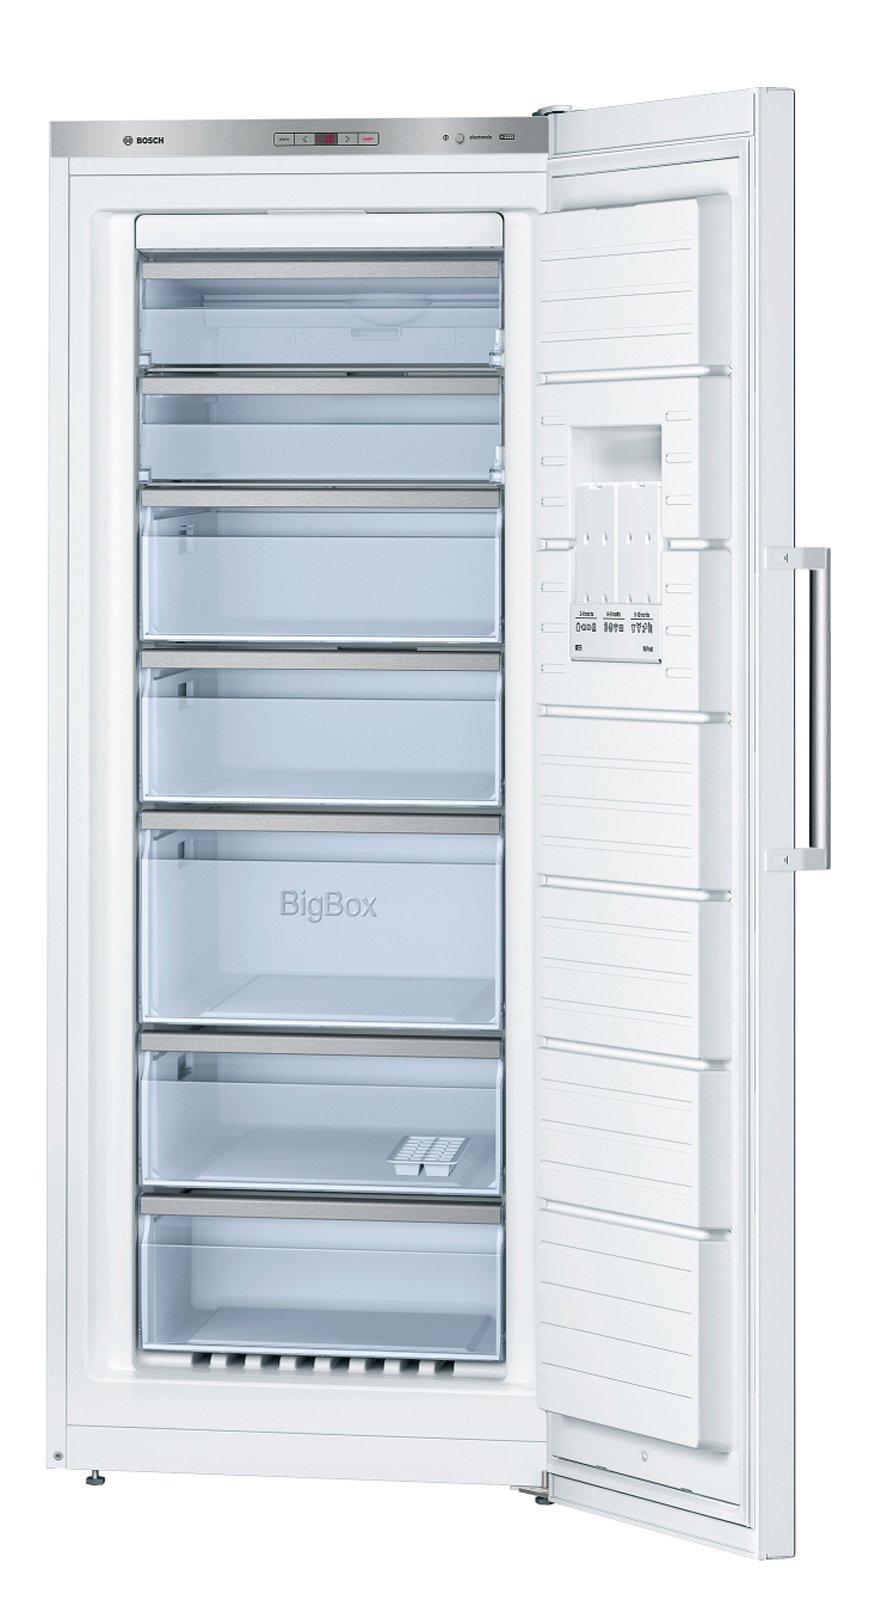 Congelatori Da Affiancare Al Frigo Cose Di Casa